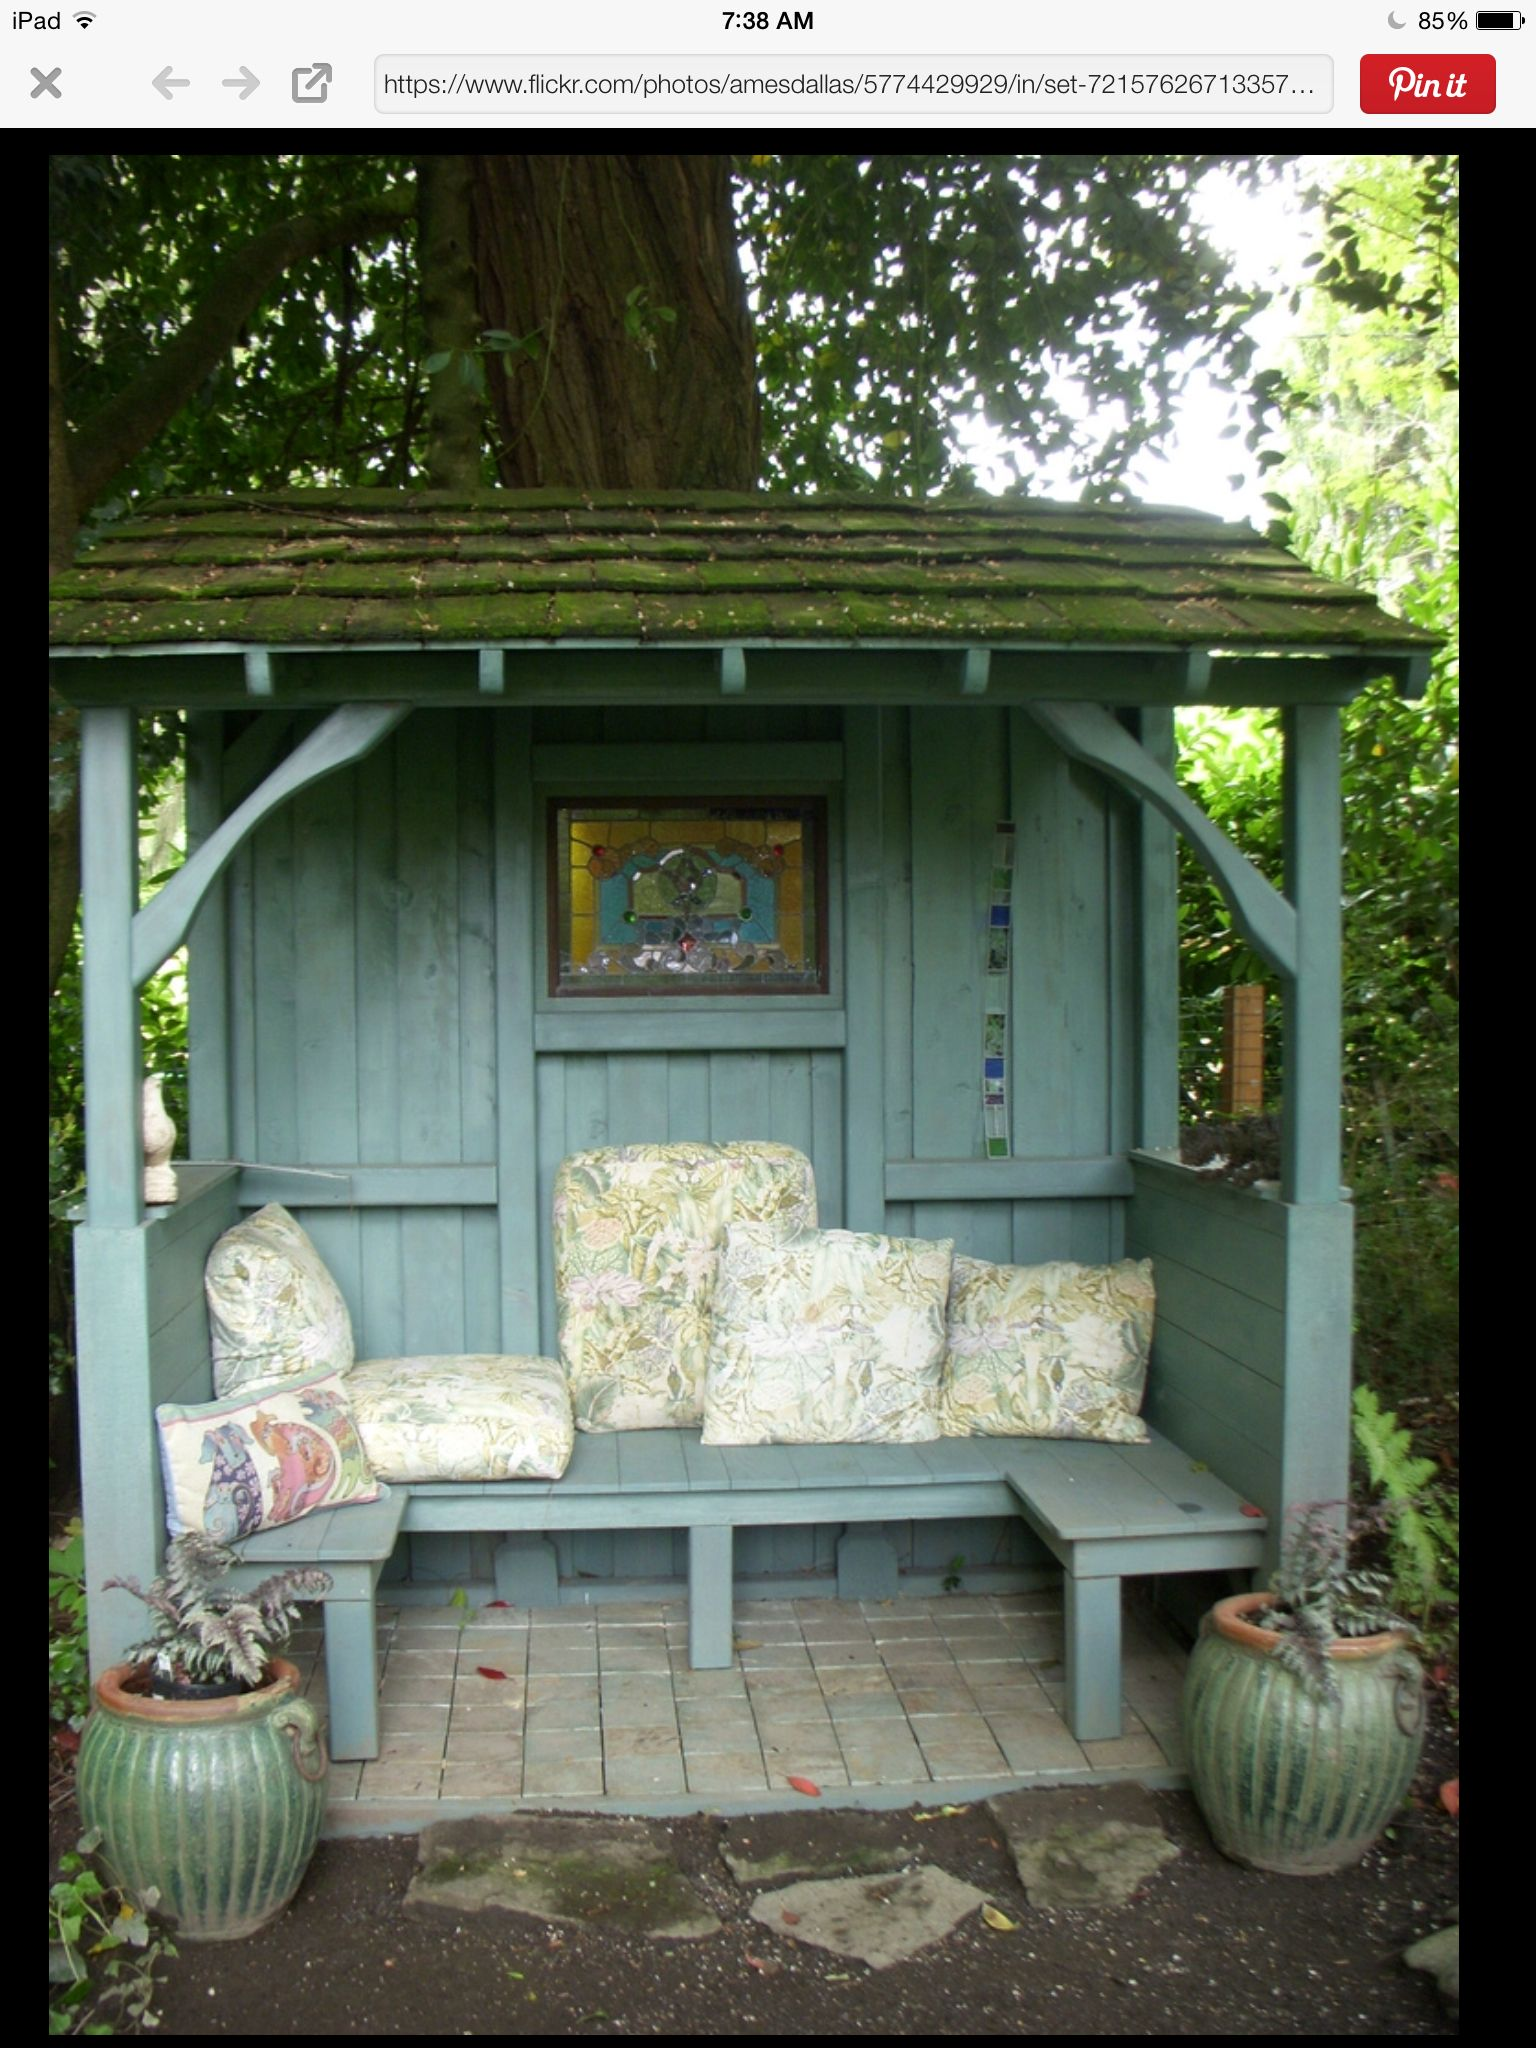 giginek garten pinterest g rten gartenh user und gartenideen. Black Bedroom Furniture Sets. Home Design Ideas